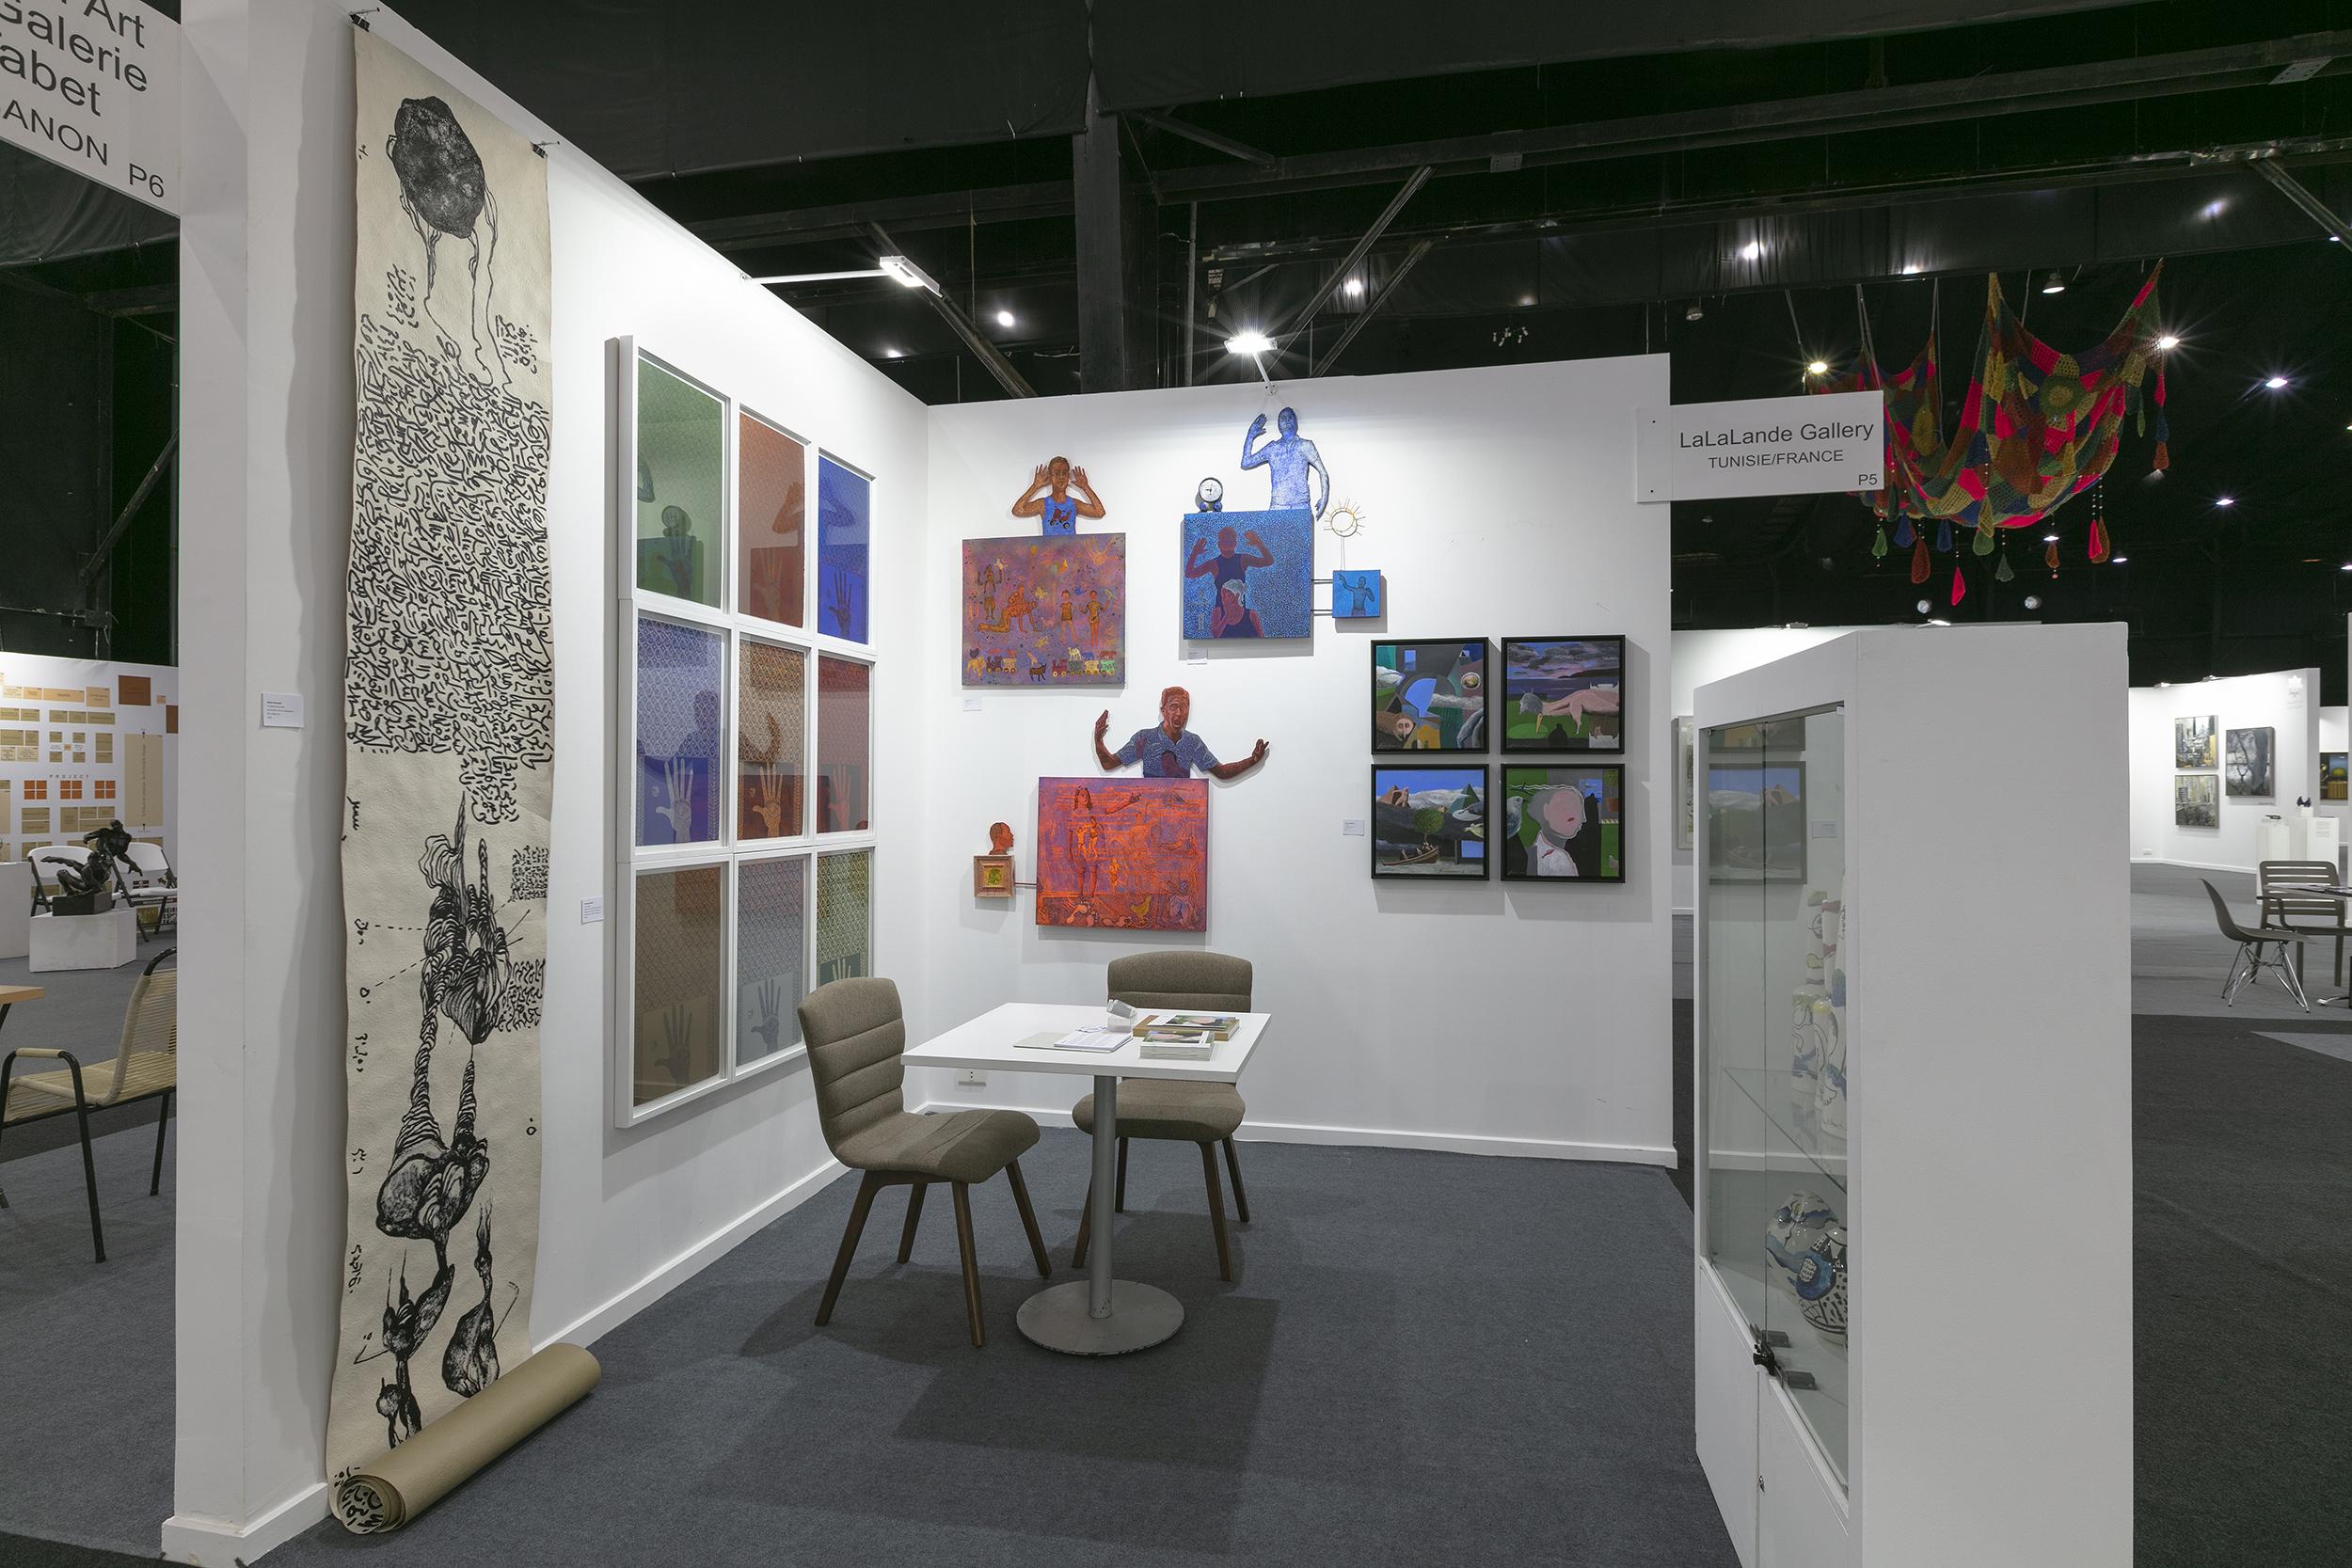 Galerie La La Lande